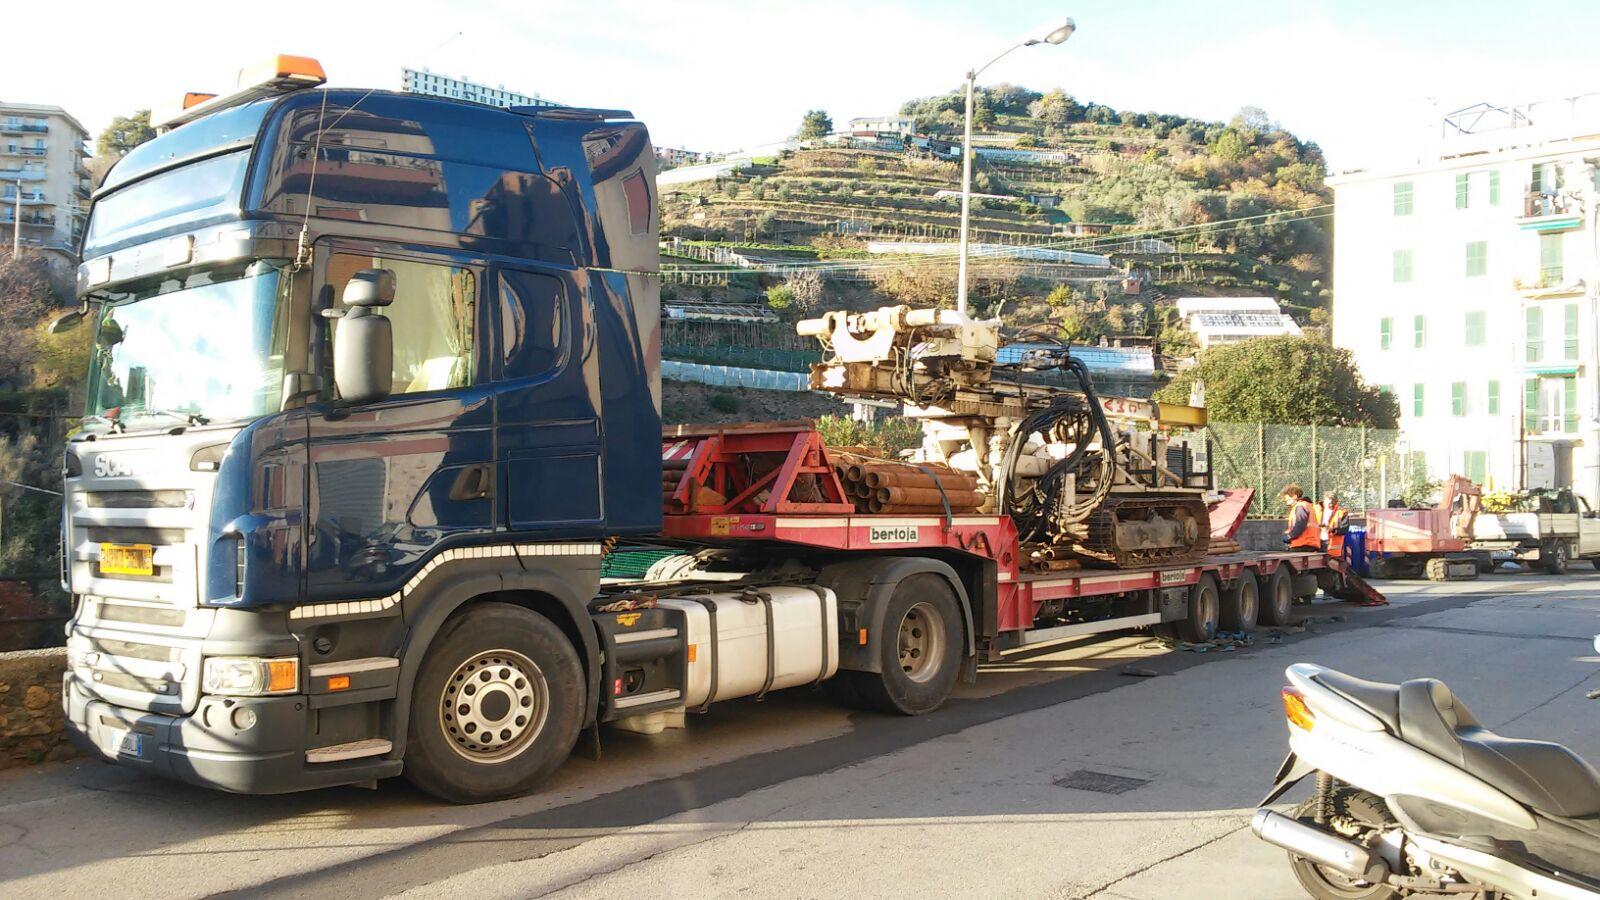 Trasporto-sonda-perforatrice-cingolata_5